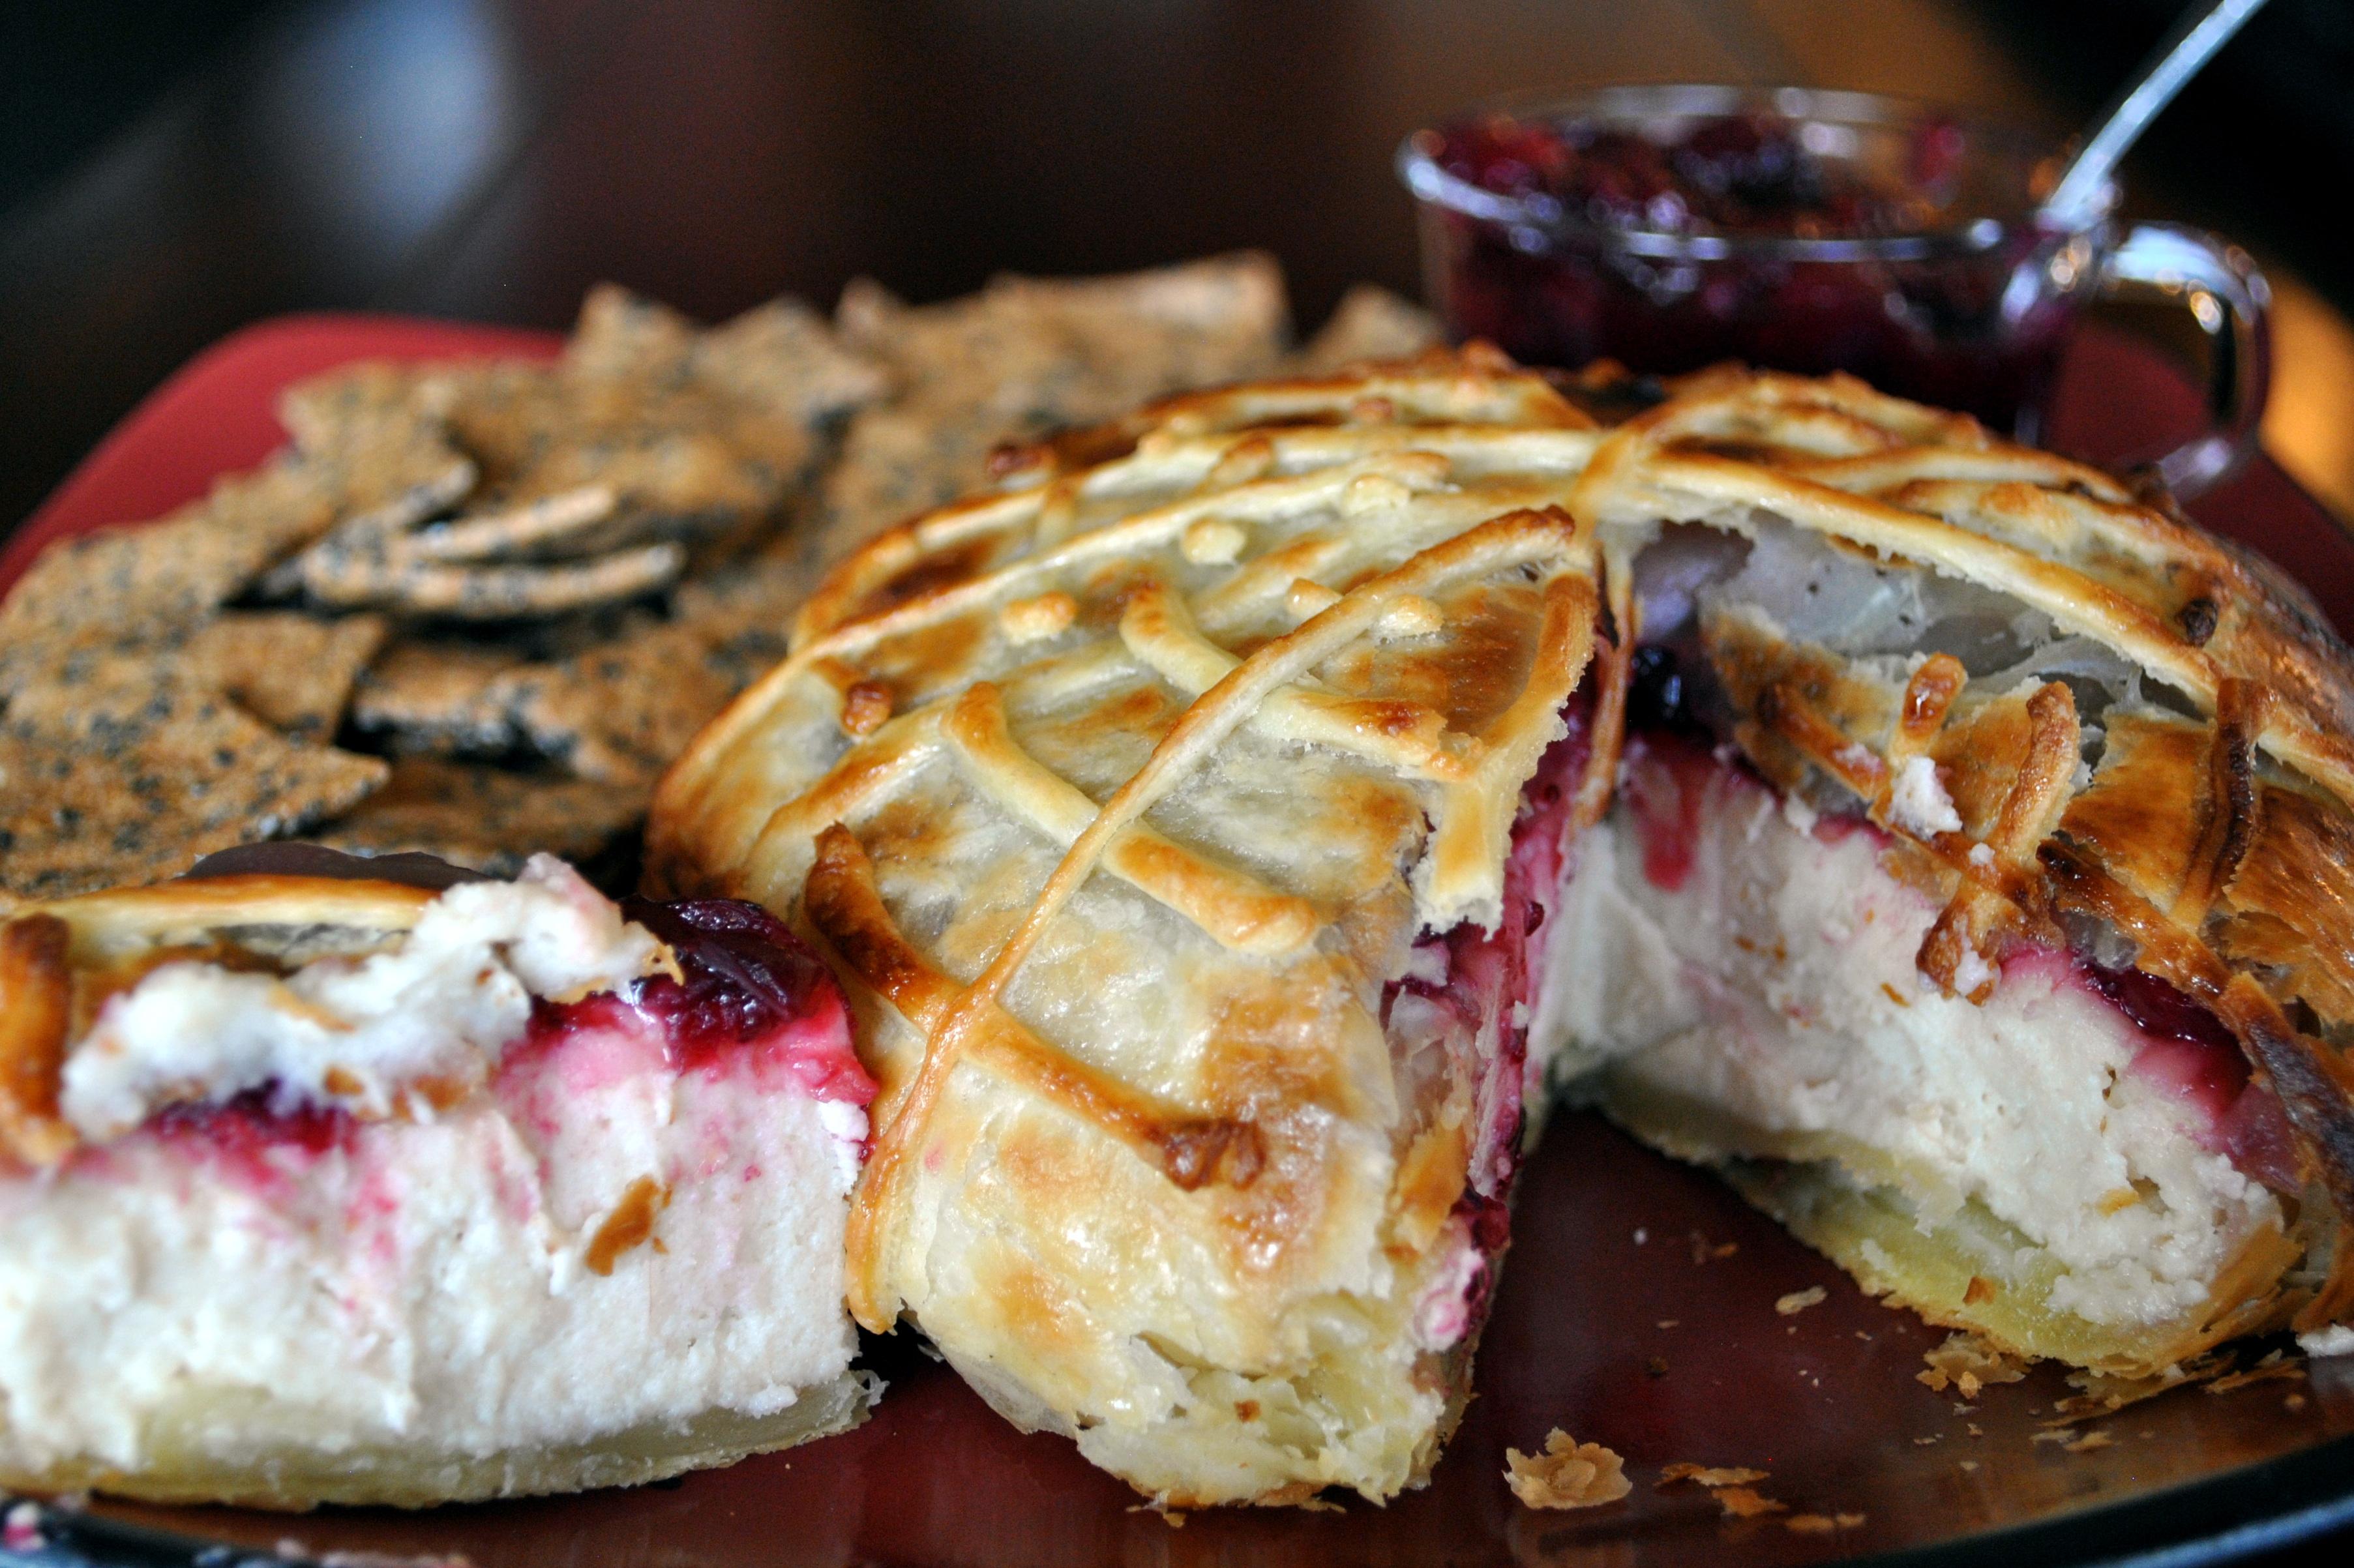 ... Potluck – Spooky Vegan Macadamia Nut Brie en Croute | Vedged Out